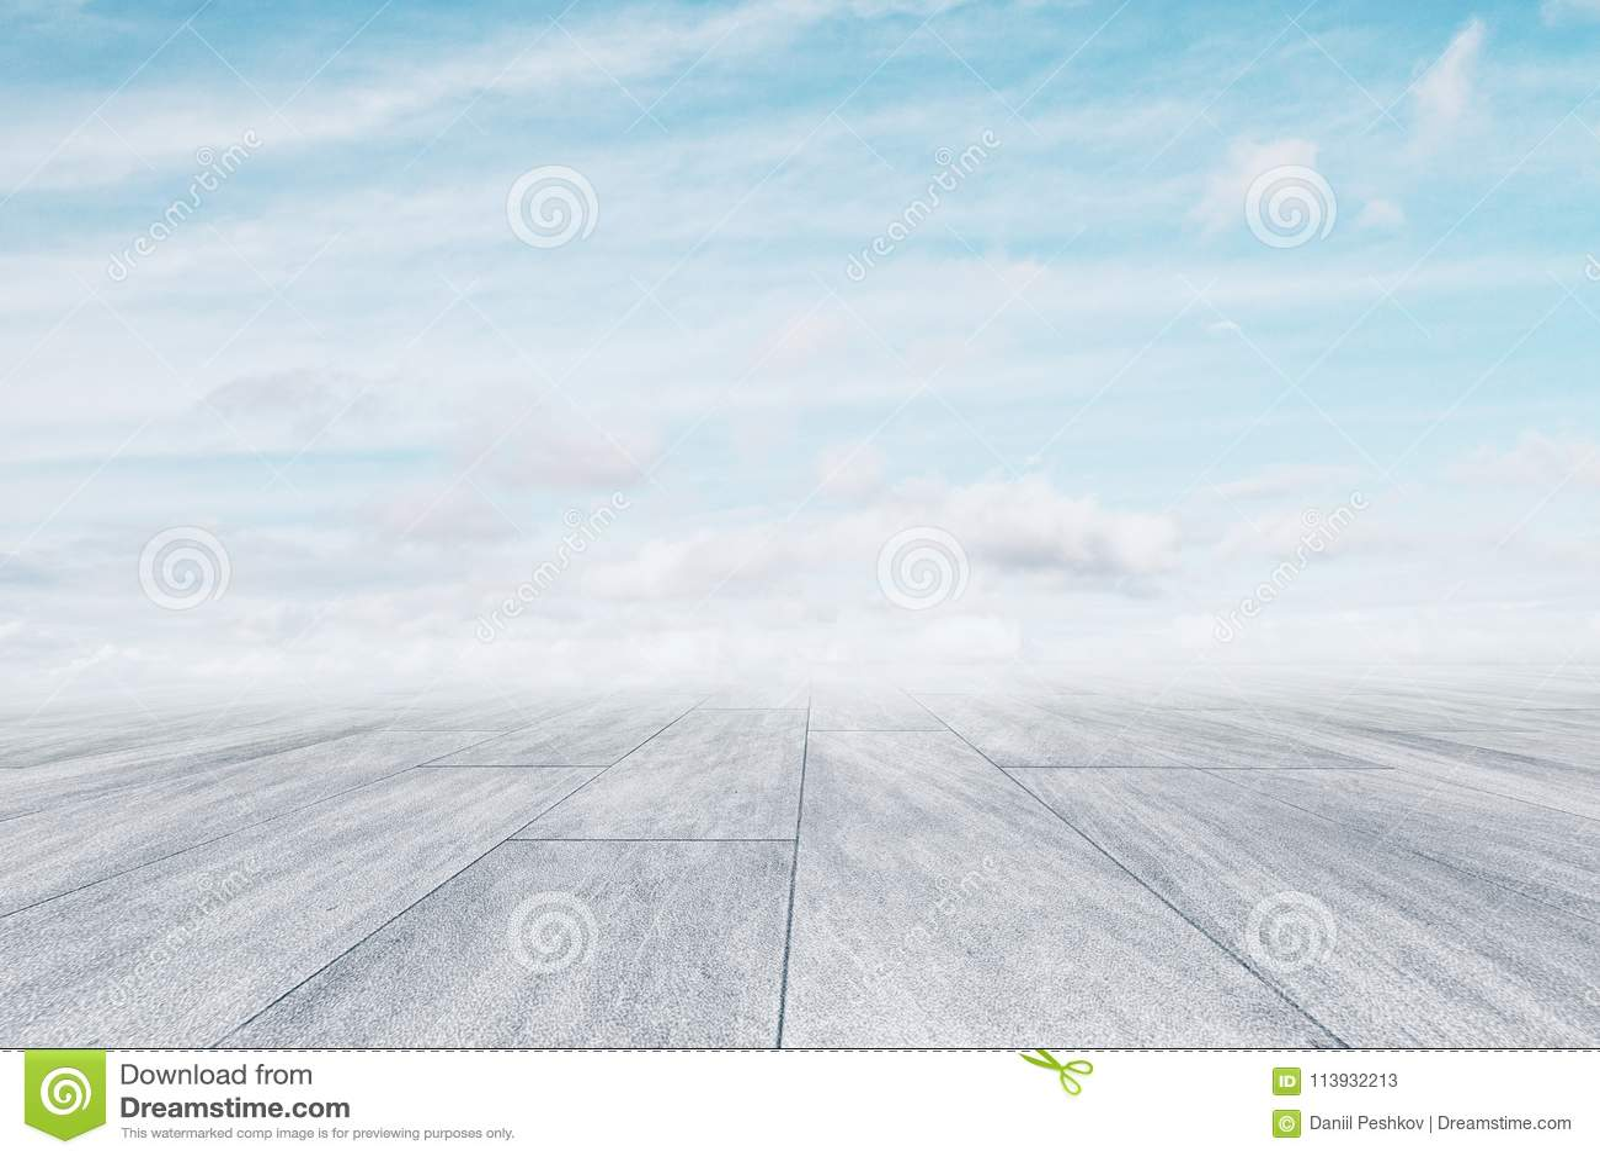 Creative Sky And Ground Background Stock Image Image Of Nobody